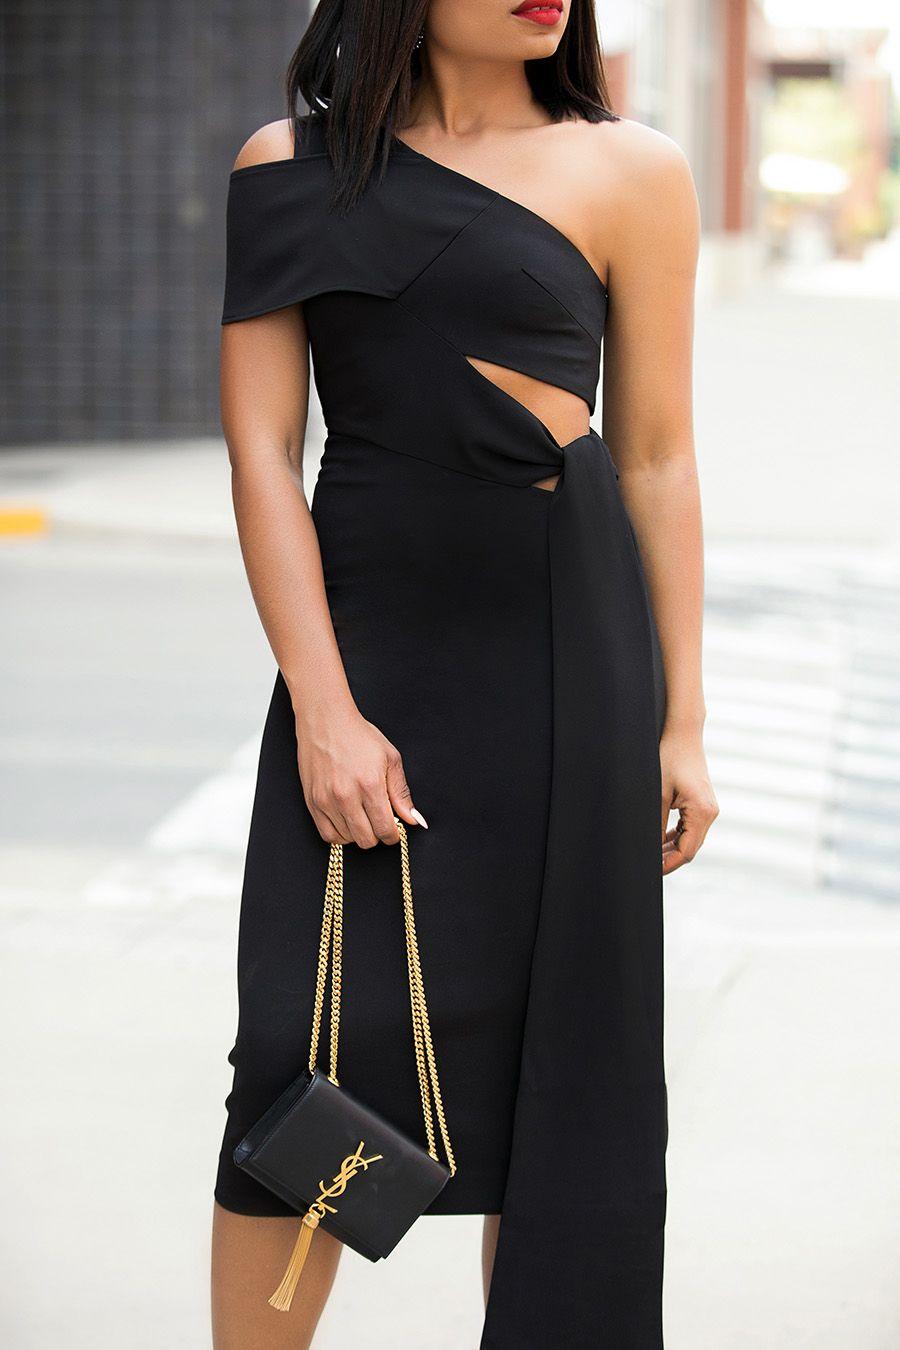 How To Wear Black To Summer Wedding Fashion Curvy Fashion Fashion Dresses [ 1350 x 900 Pixel ]